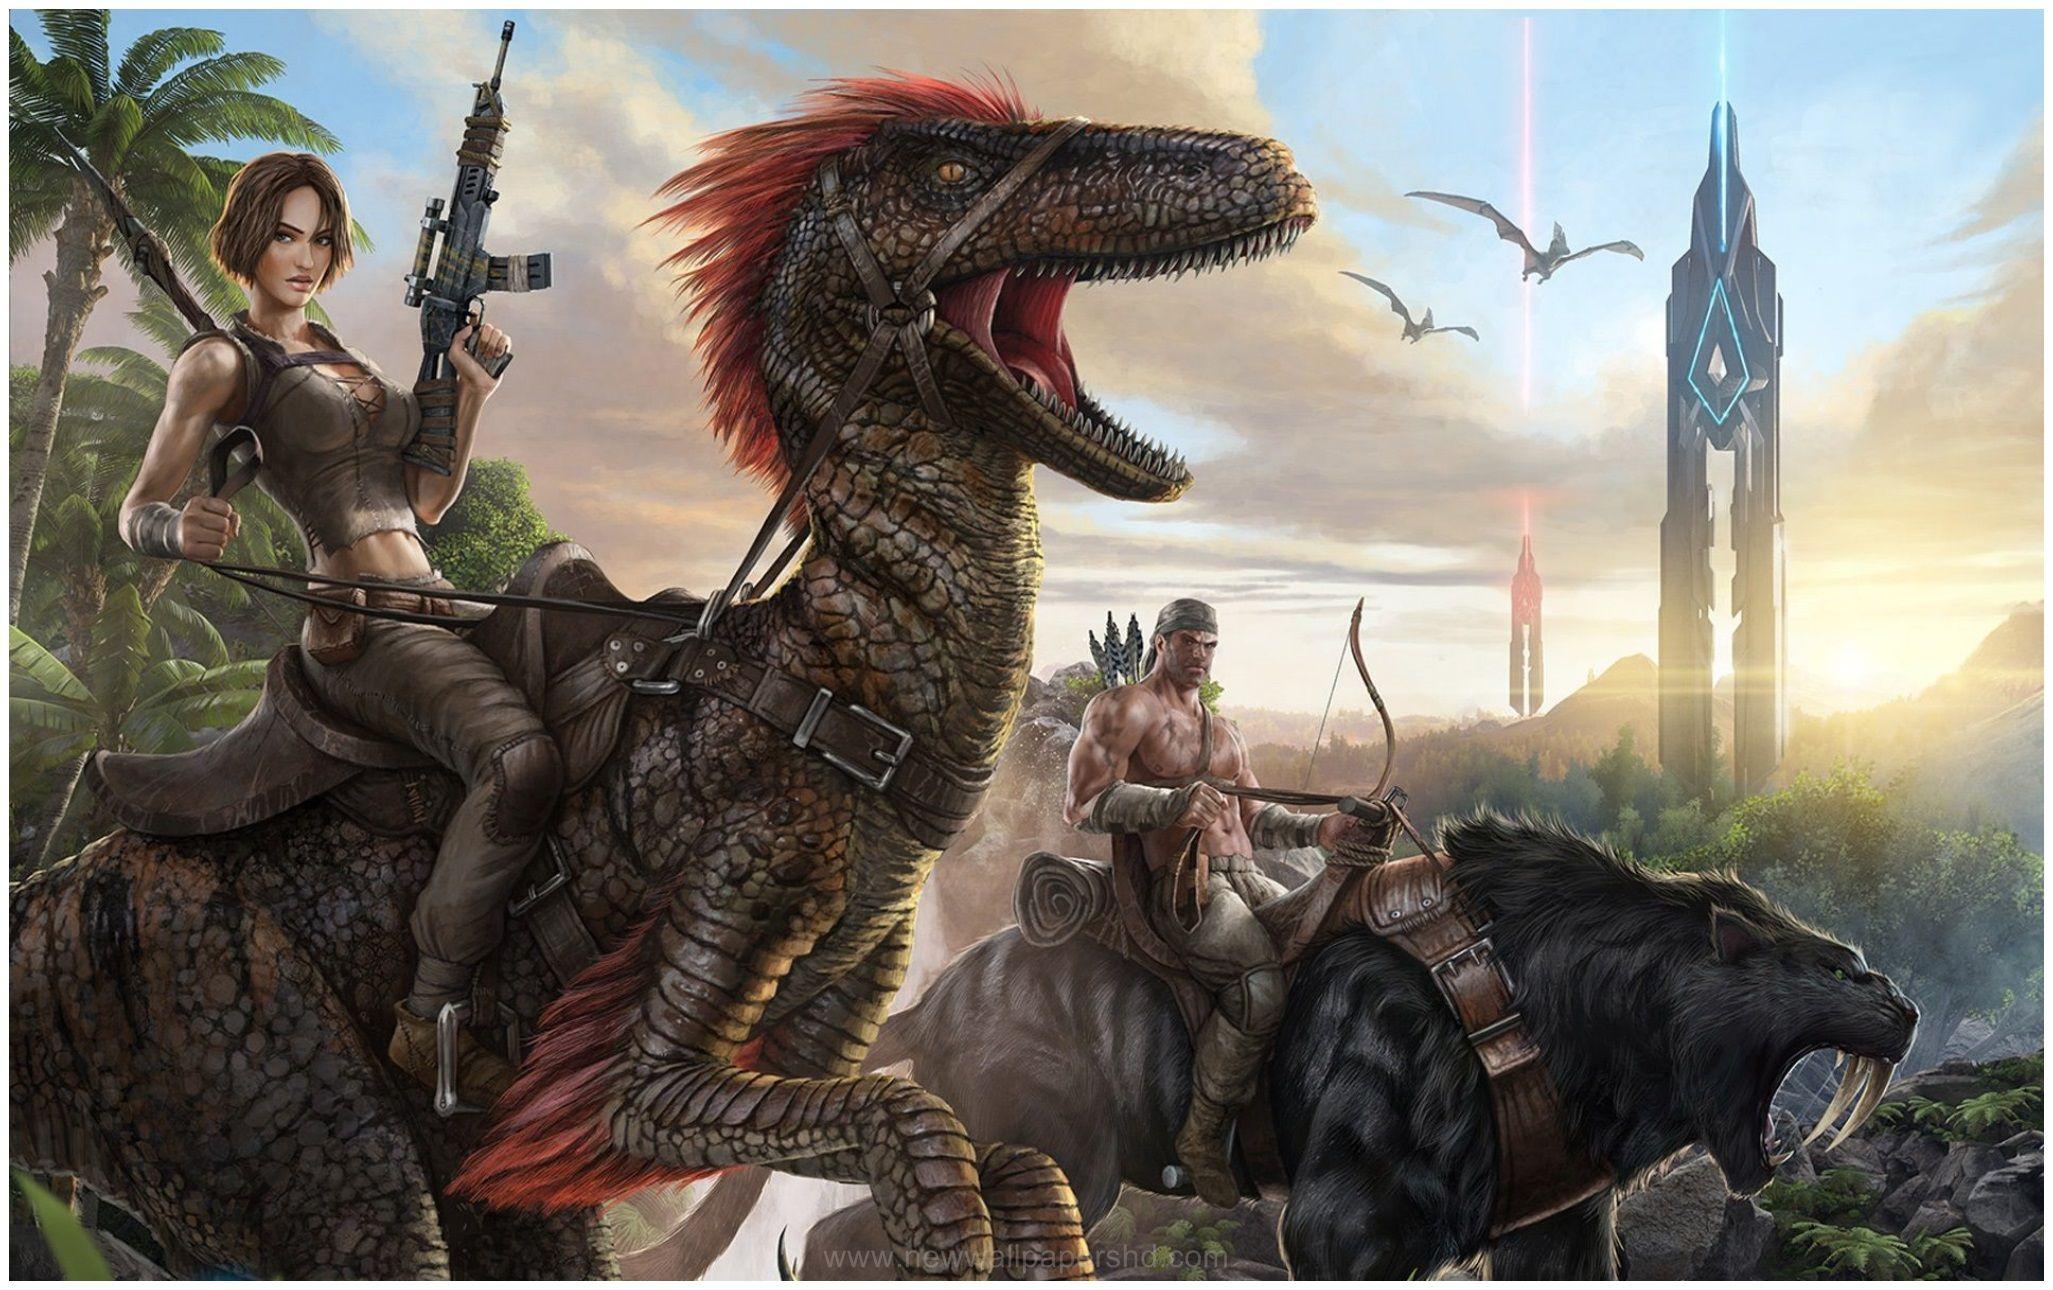 Image For Ark Survival Evolved Gaming Hd Wallpaper Evolve Game